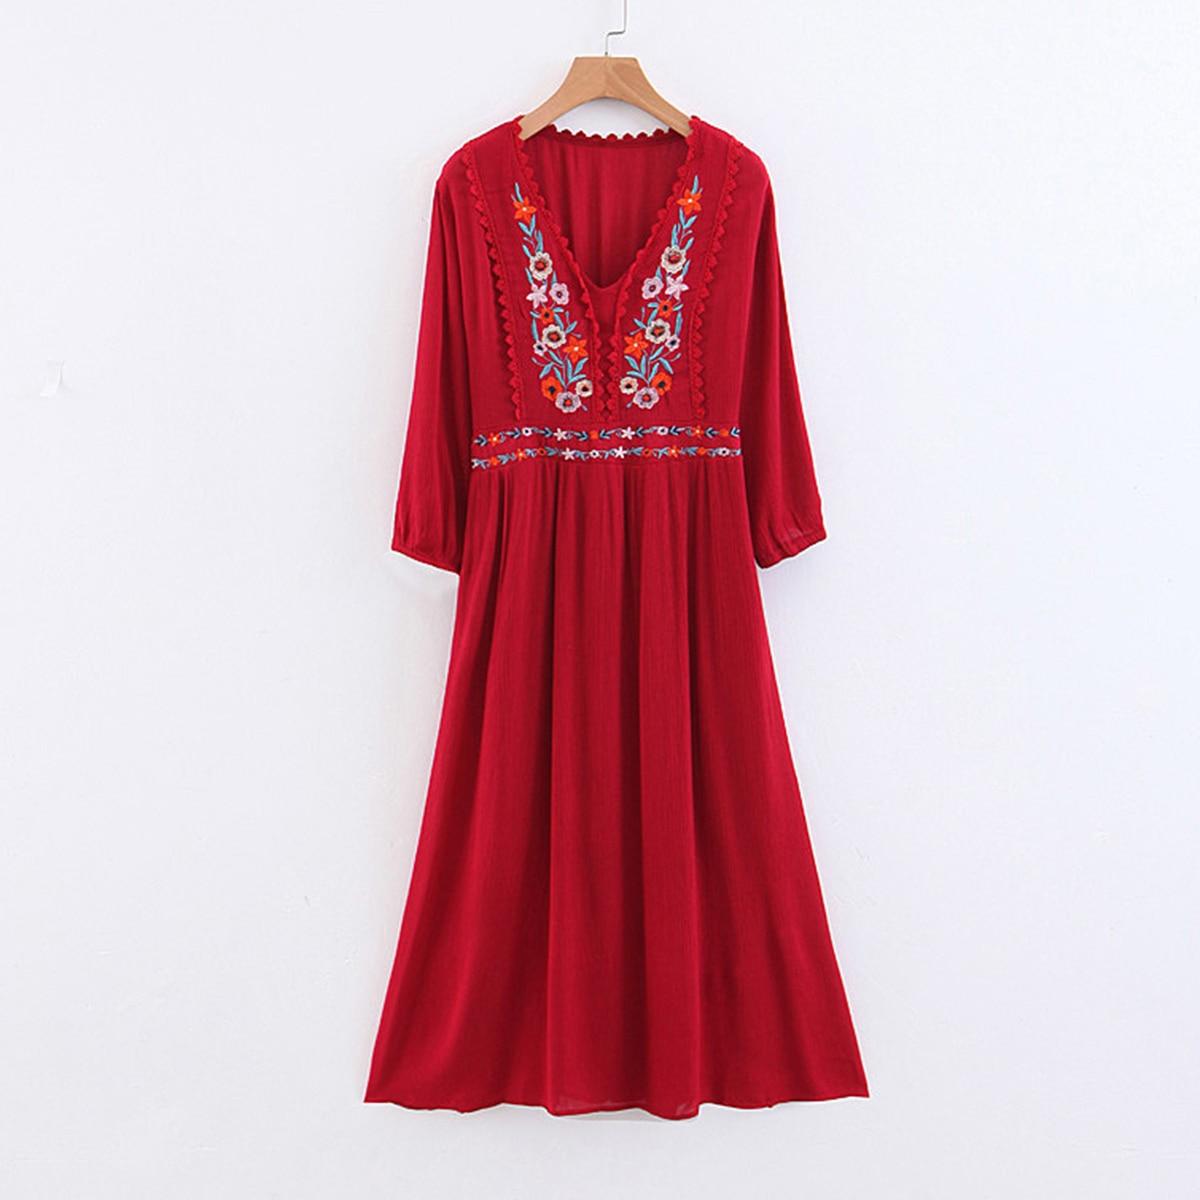 f77dc1e148 Embroidery Floral Midi Dress Vintage V-neck Loose Dresses Women Summer Dresses  Boho Chic Beach